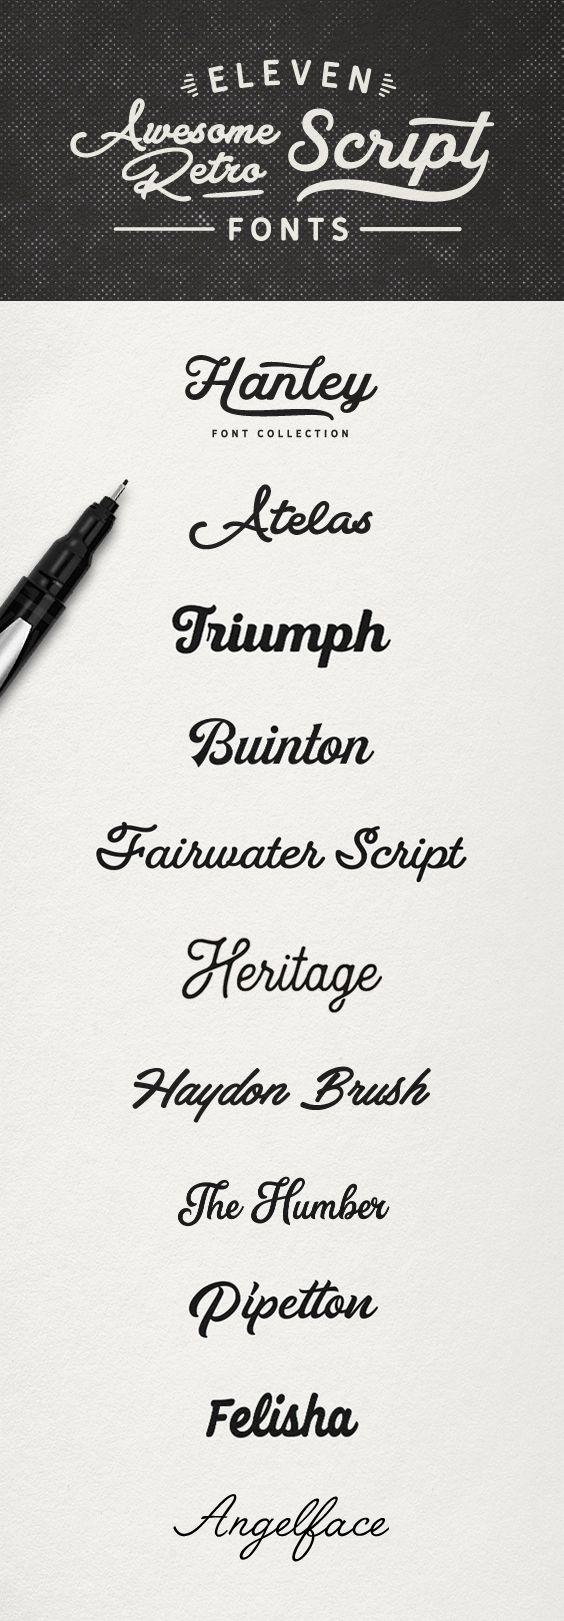 Awesome Retro Script Fonts Fonts. Script, retro, branding, vintage, script font, typography, logo, lettering,